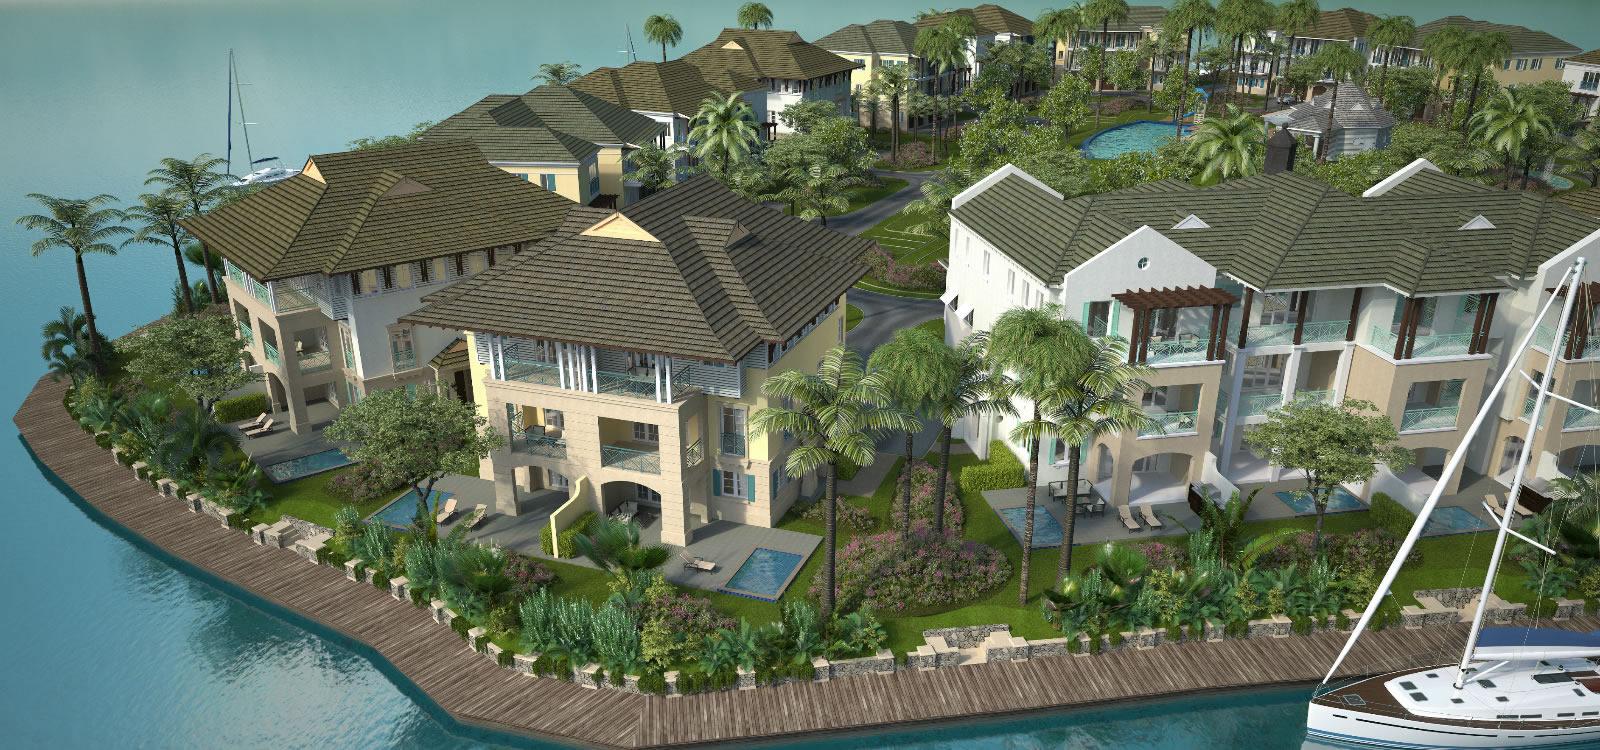 Cayman Islands Real Estate for Sale   Provenance Properties